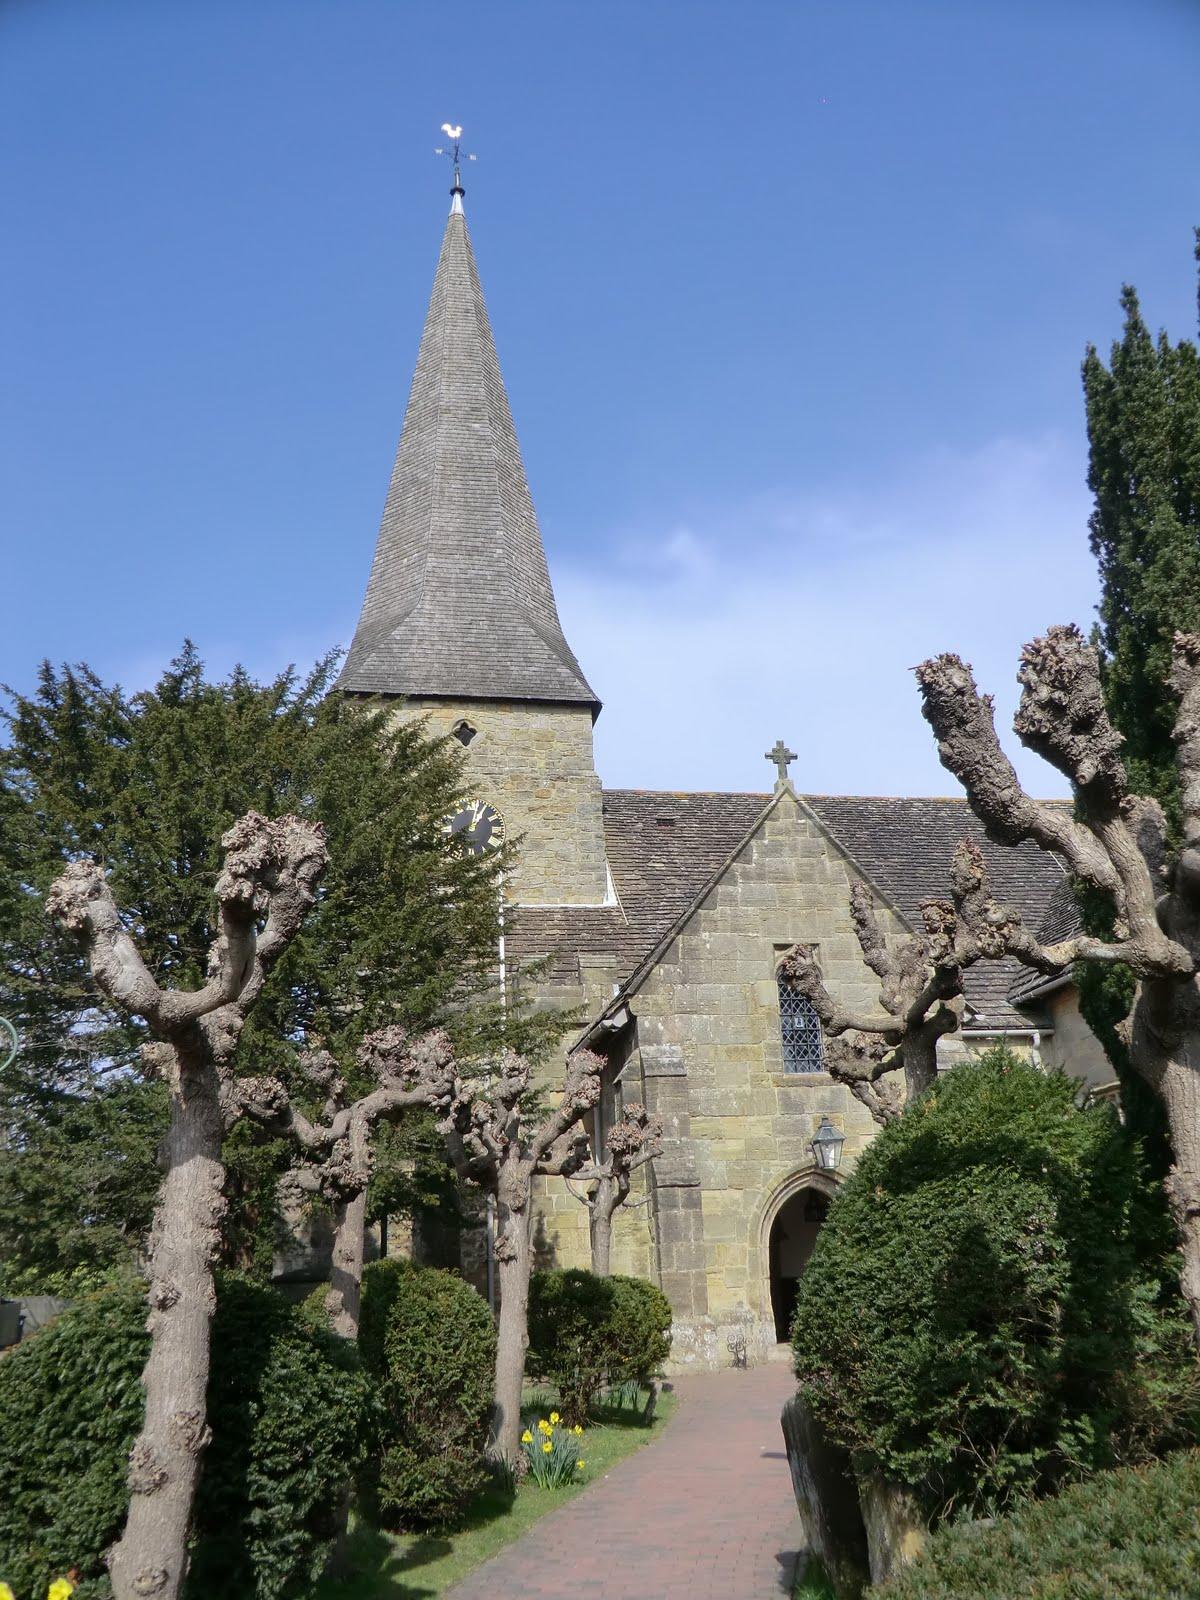 CIMG1869 All Saints church, Lindfield